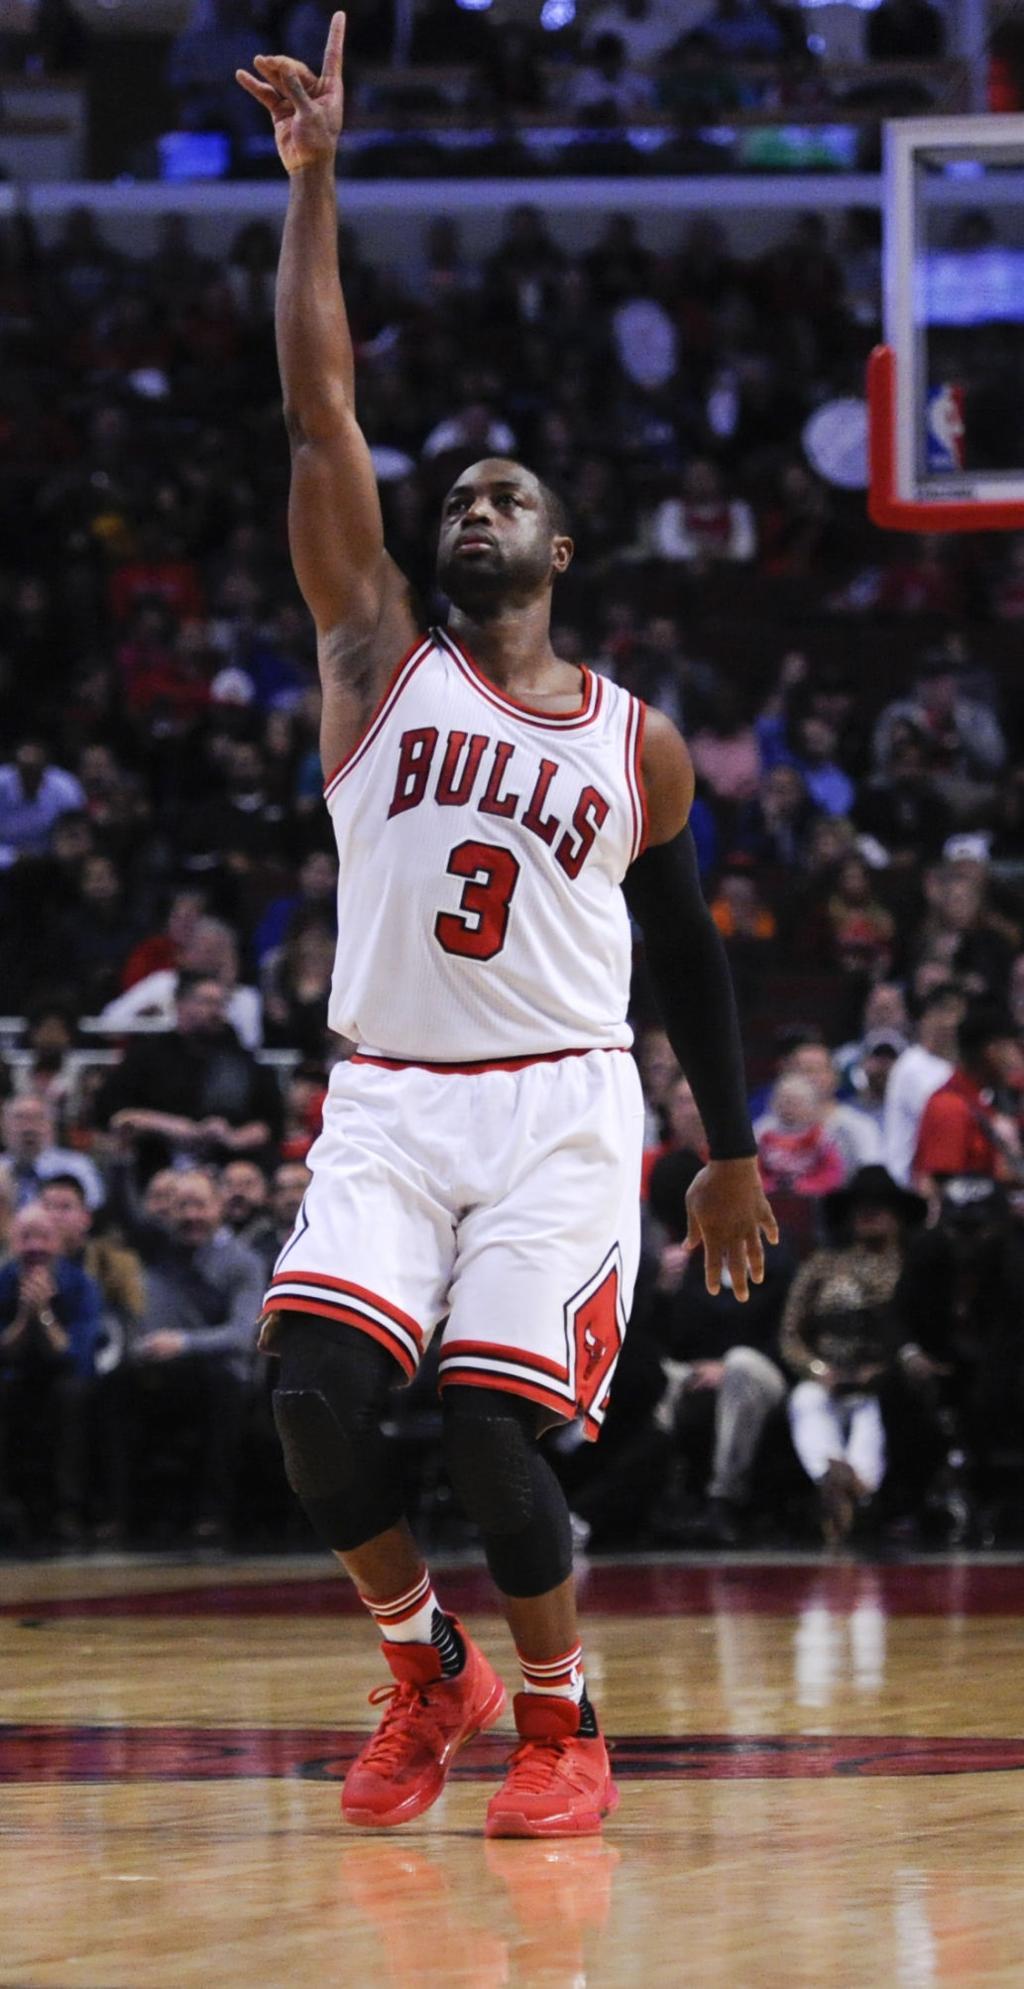 57dc316e75b Celtics Bulls Basketball. Chicago Bulls guard Dwyane Wade gestures after  scoring his first basket during ...